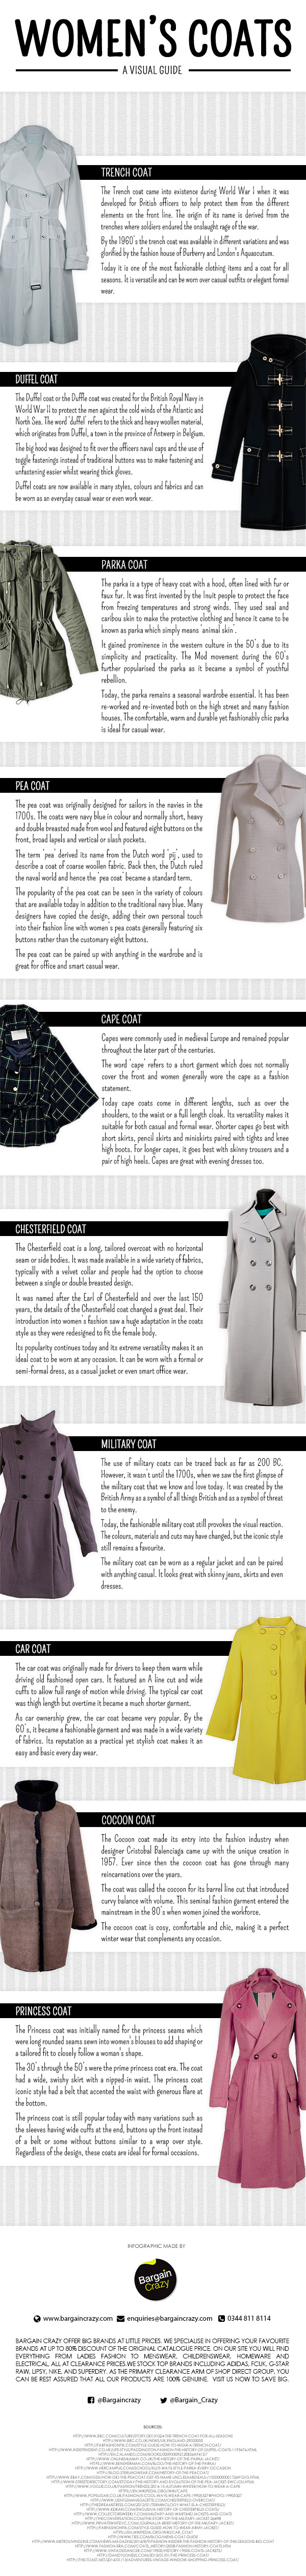 Women's Coats Infographic